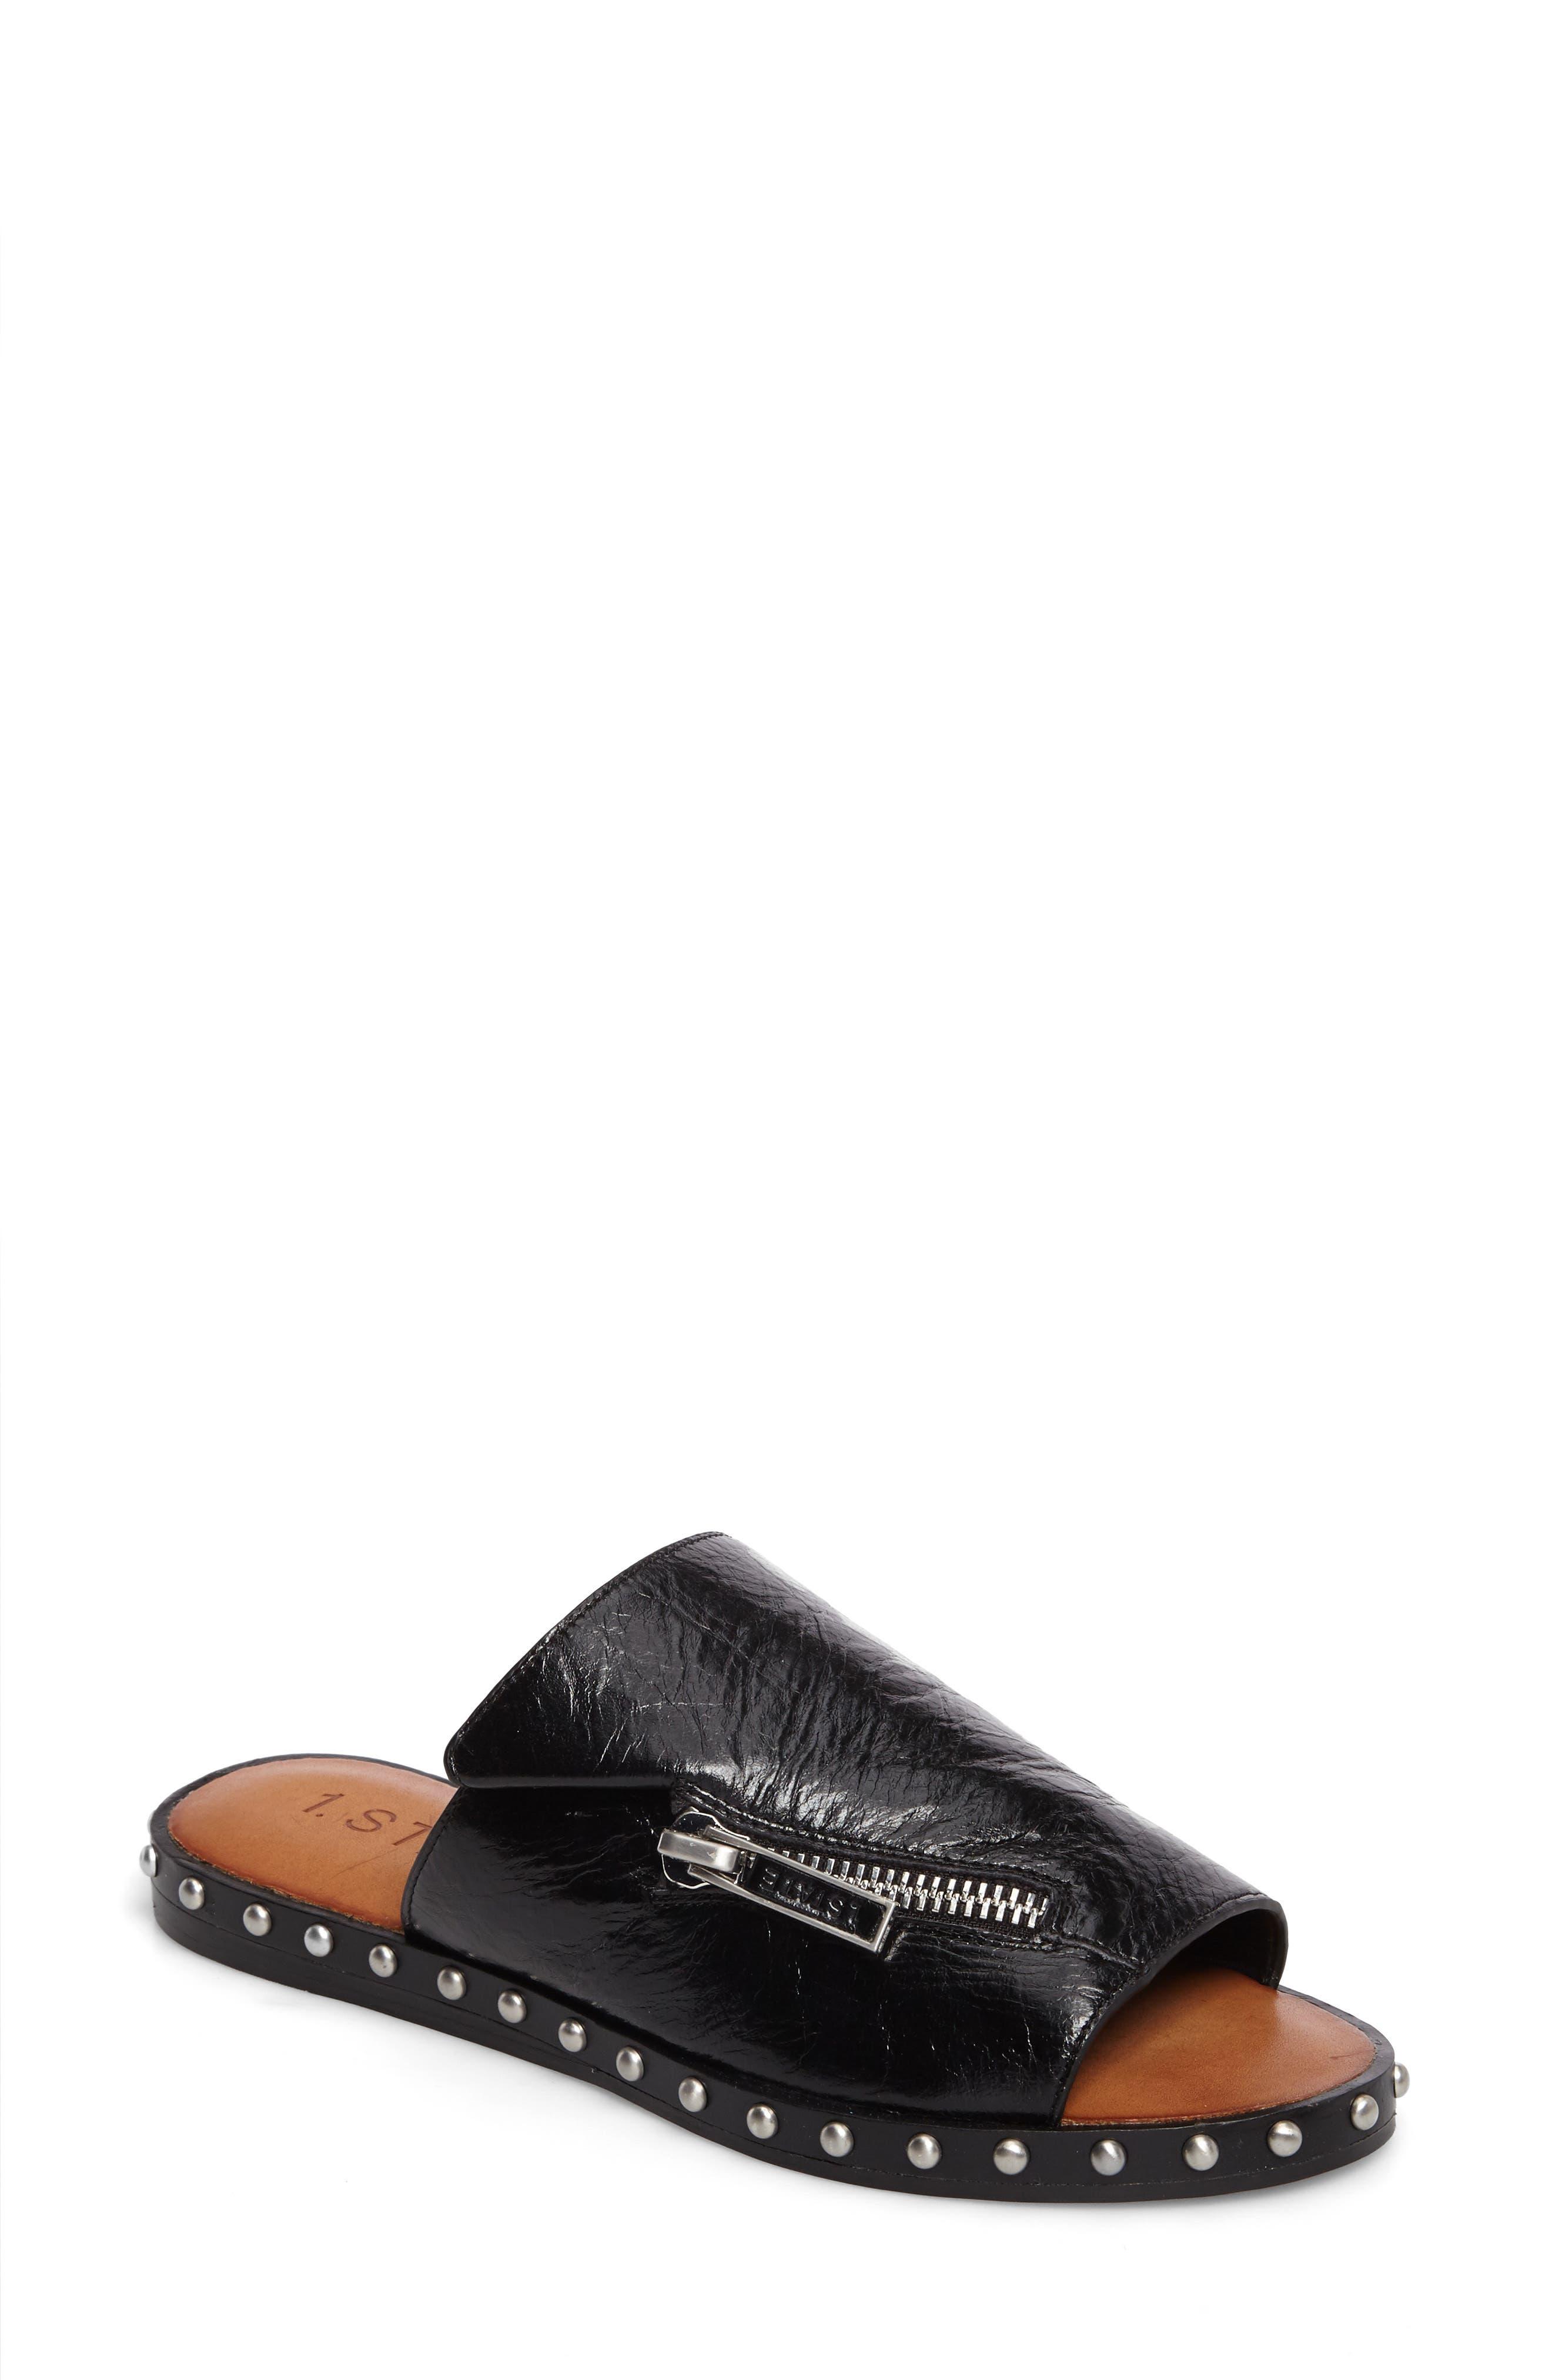 Cadwyn Slide Sandal,                             Main thumbnail 1, color,                             Black Leather